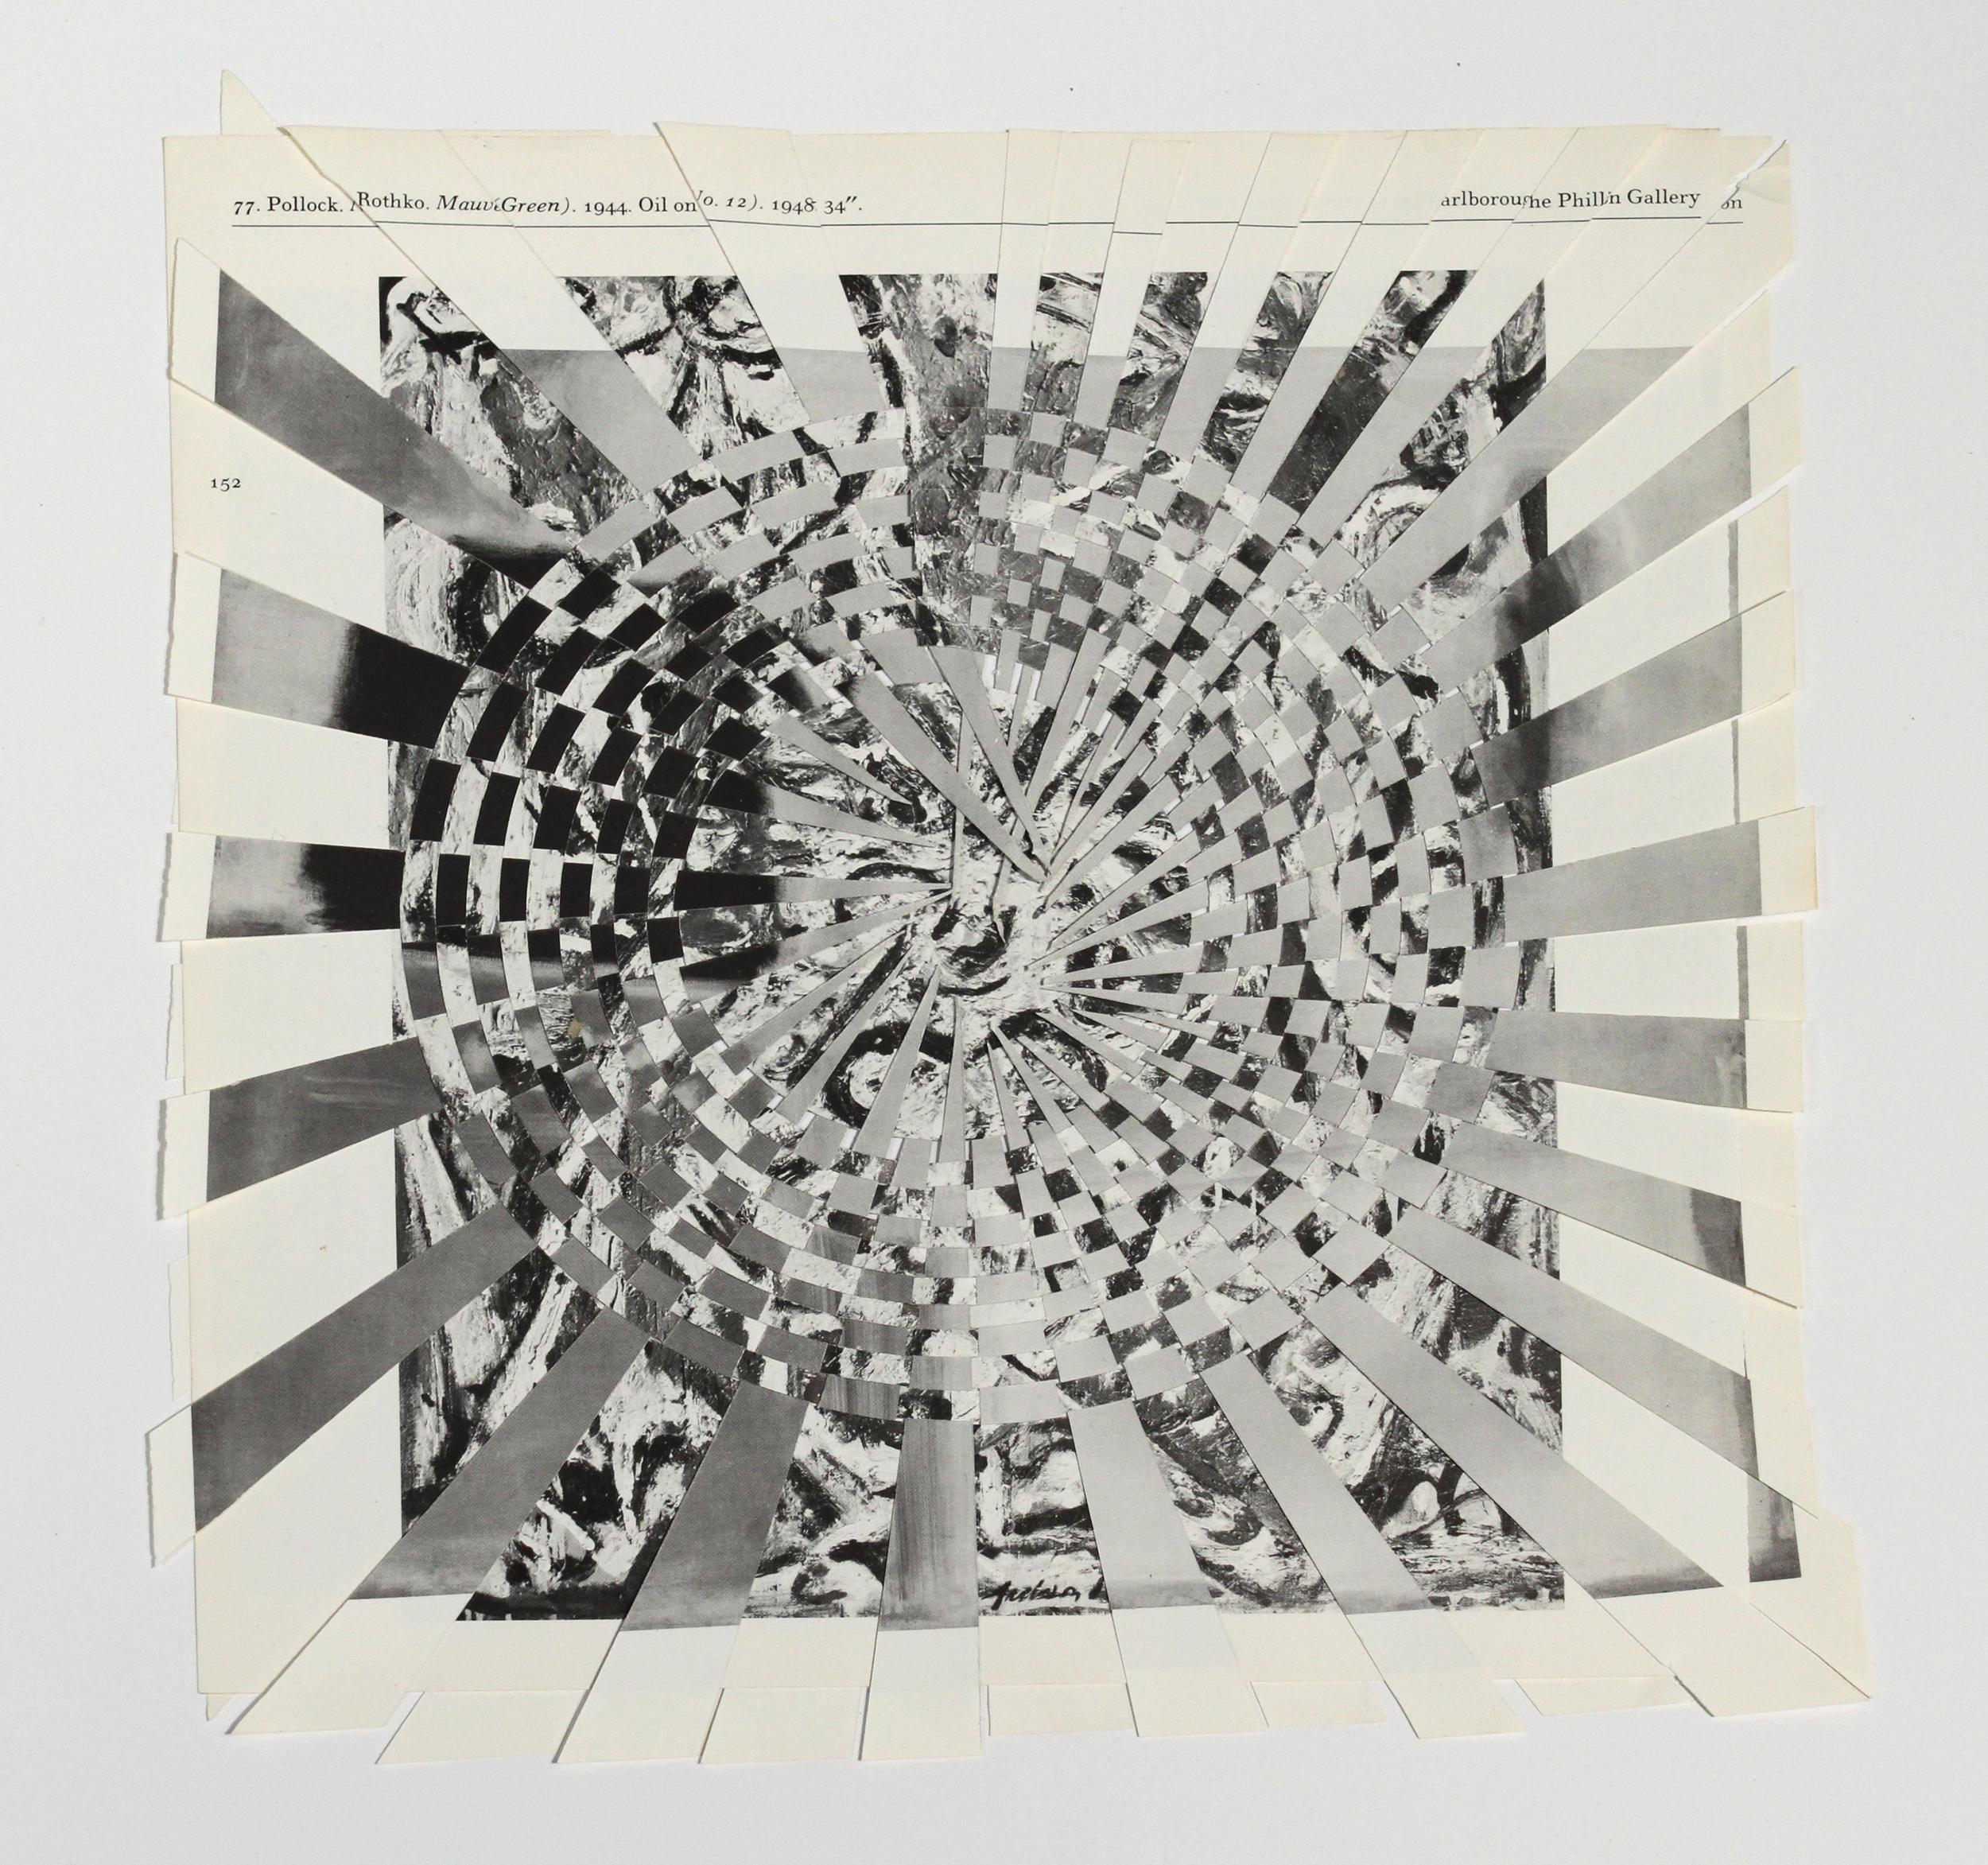 pollockrothko (black and white #1), paper weaving, 10 x 10